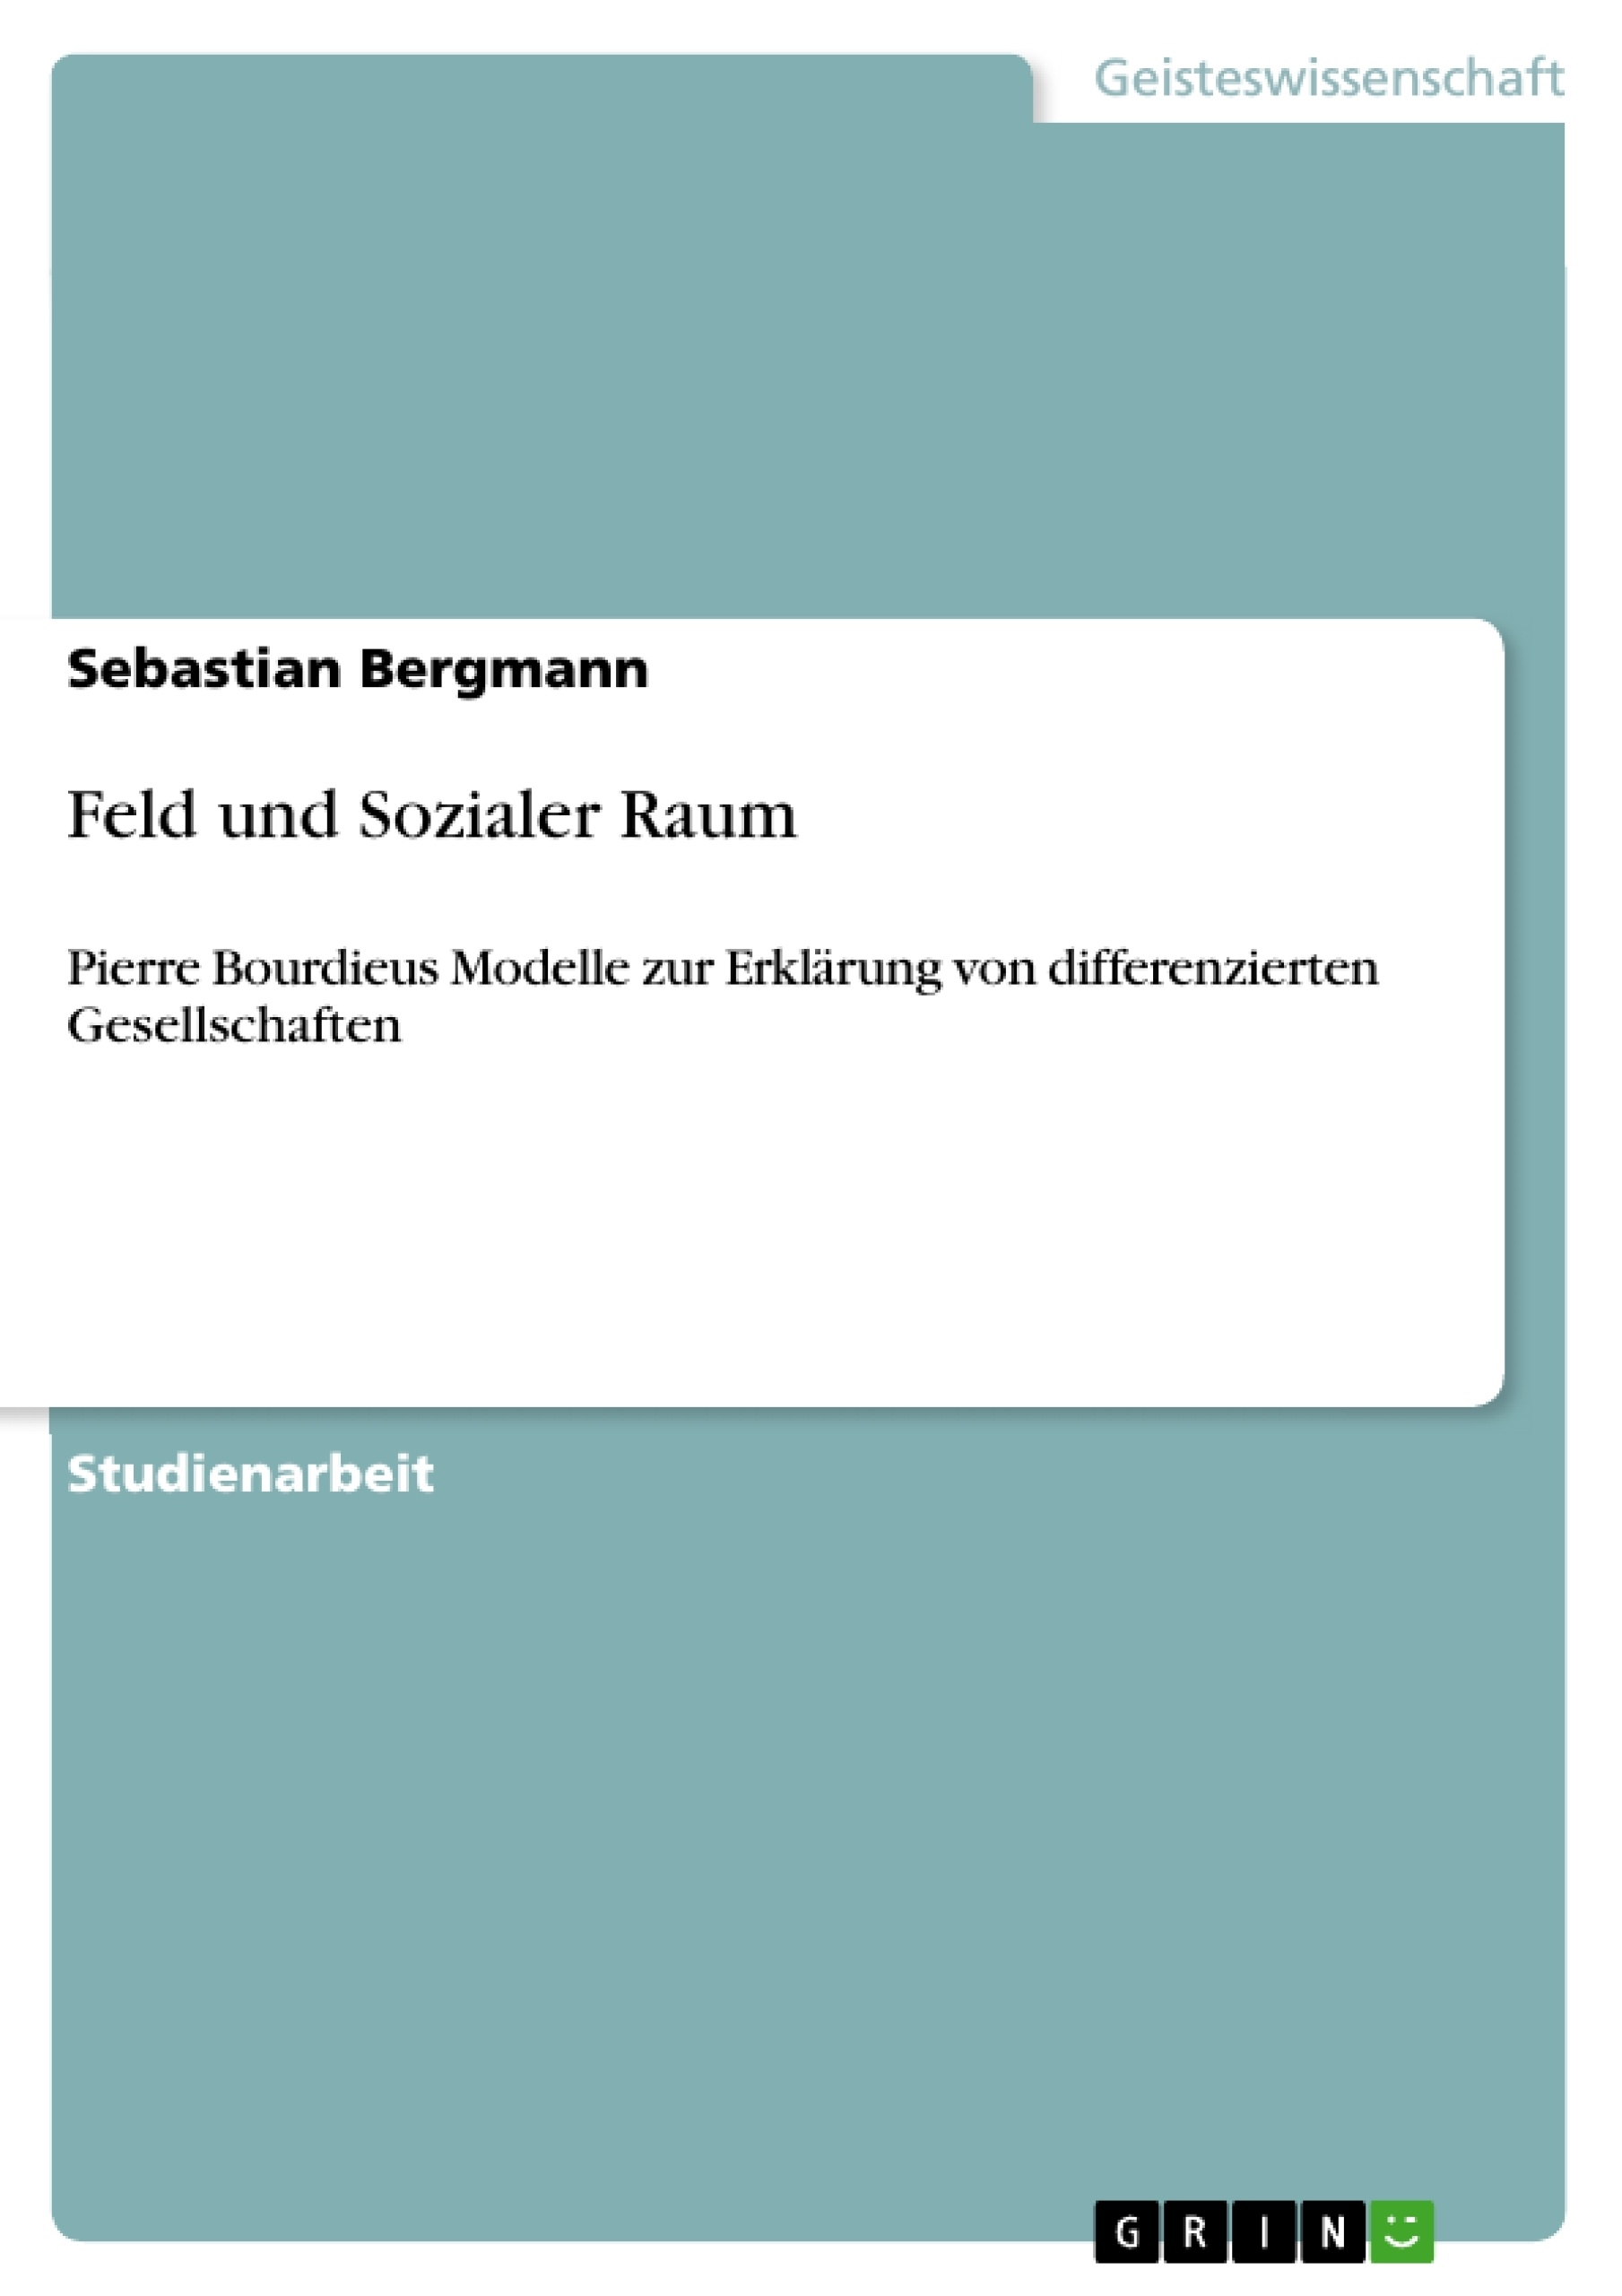 Titel: Feld und Sozialer Raum